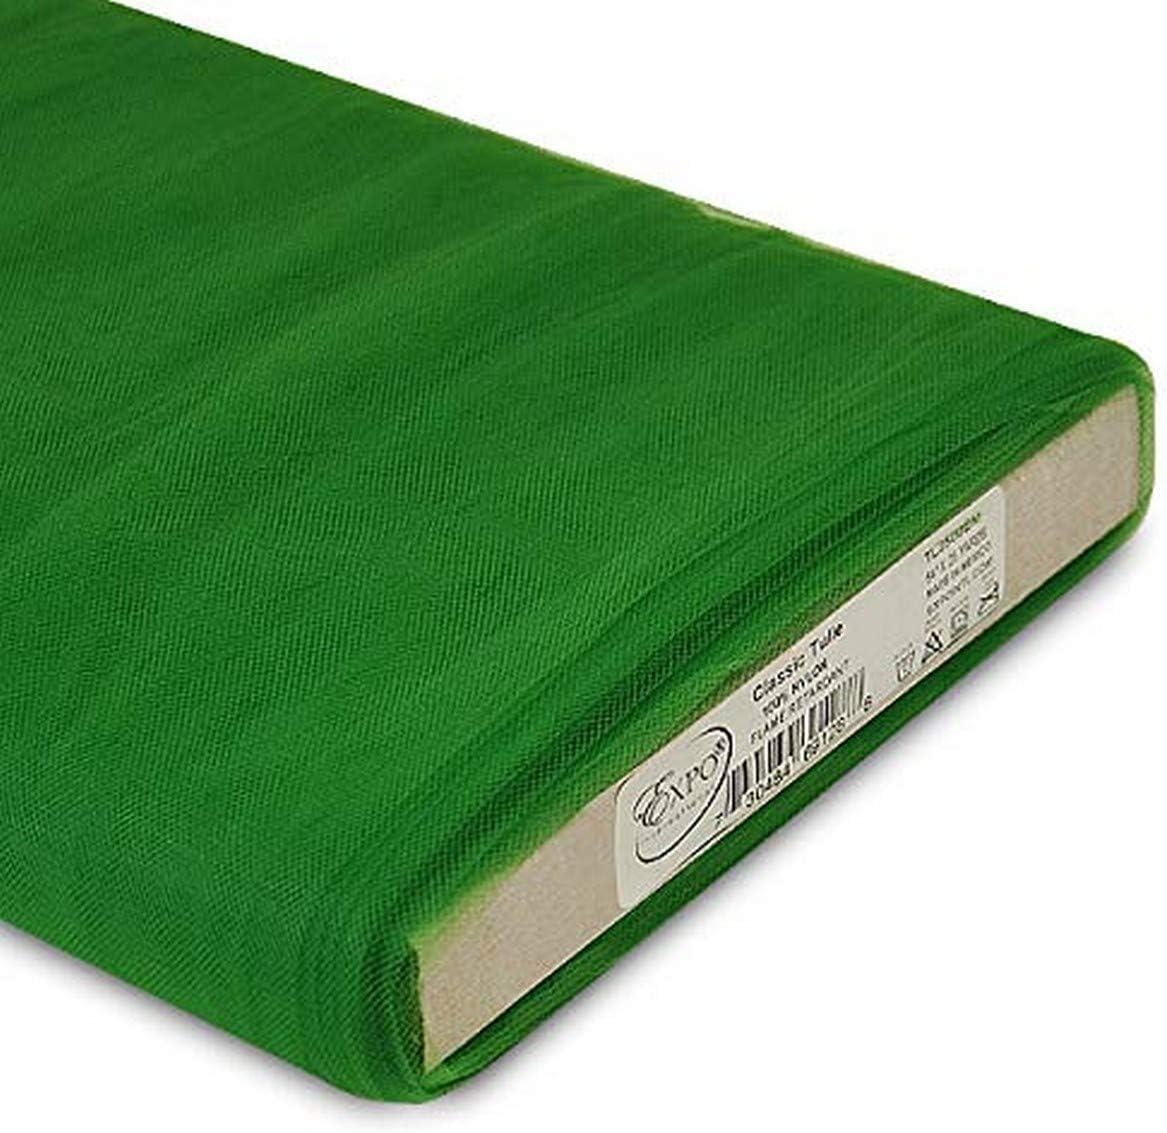 Expo International 54-Inch Classic Nylon Tulle Bolt Fabric Spool, 25-Yard, Emerald